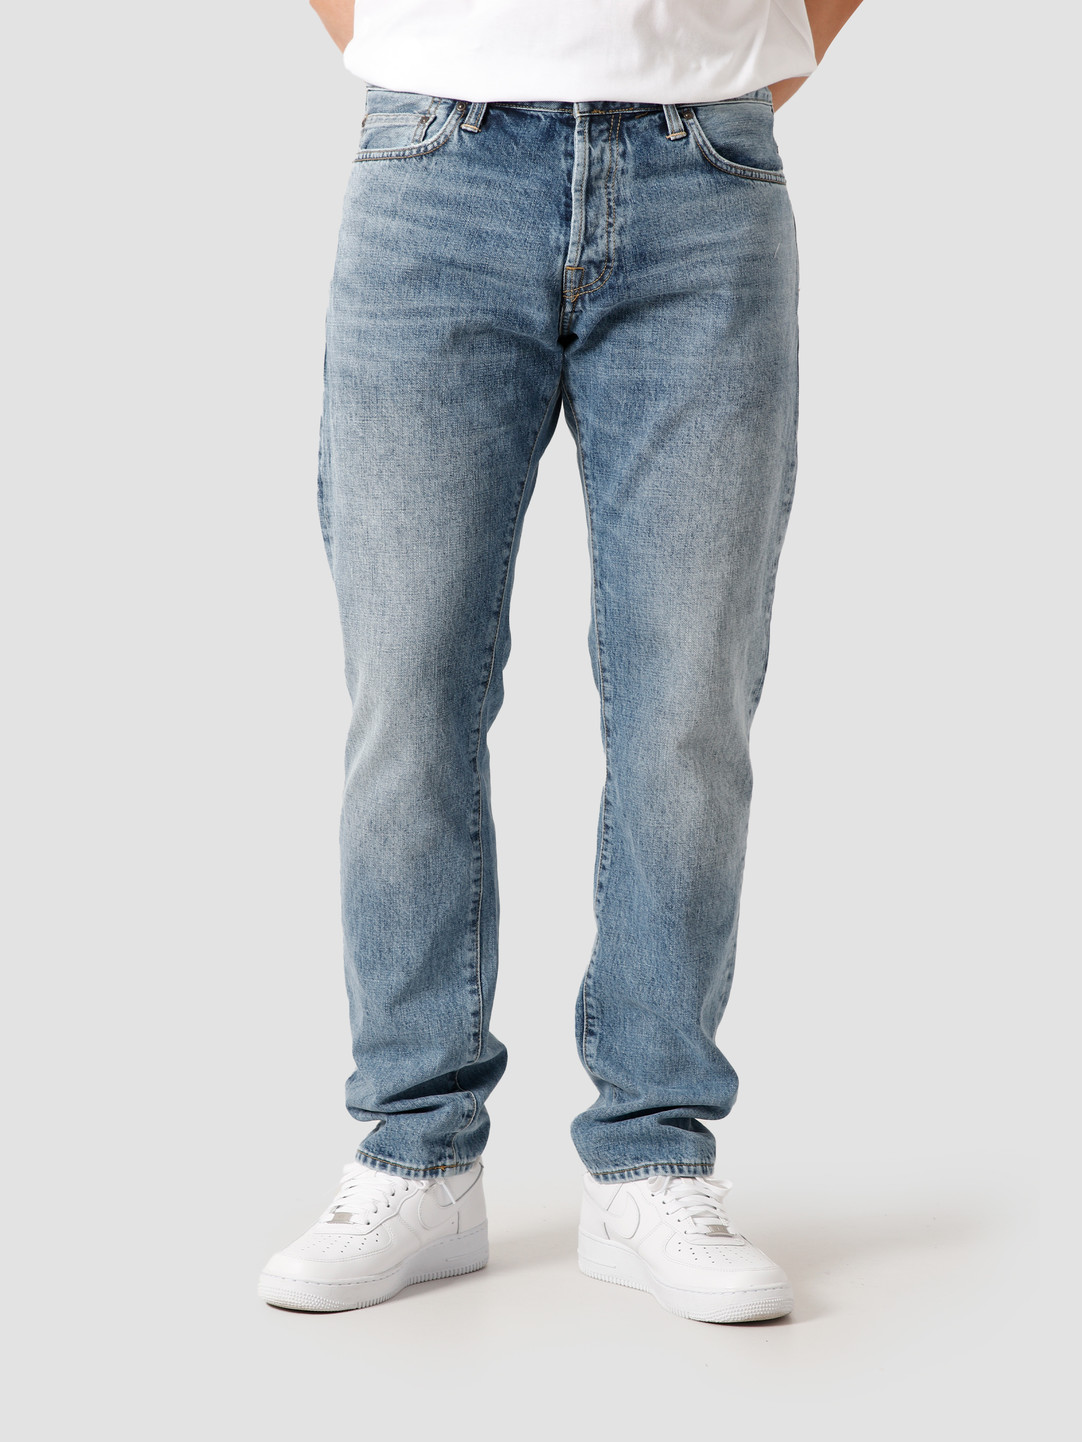 Carhartt WIP Carhartt WIP Klondike Pant Blue I016735-01WI